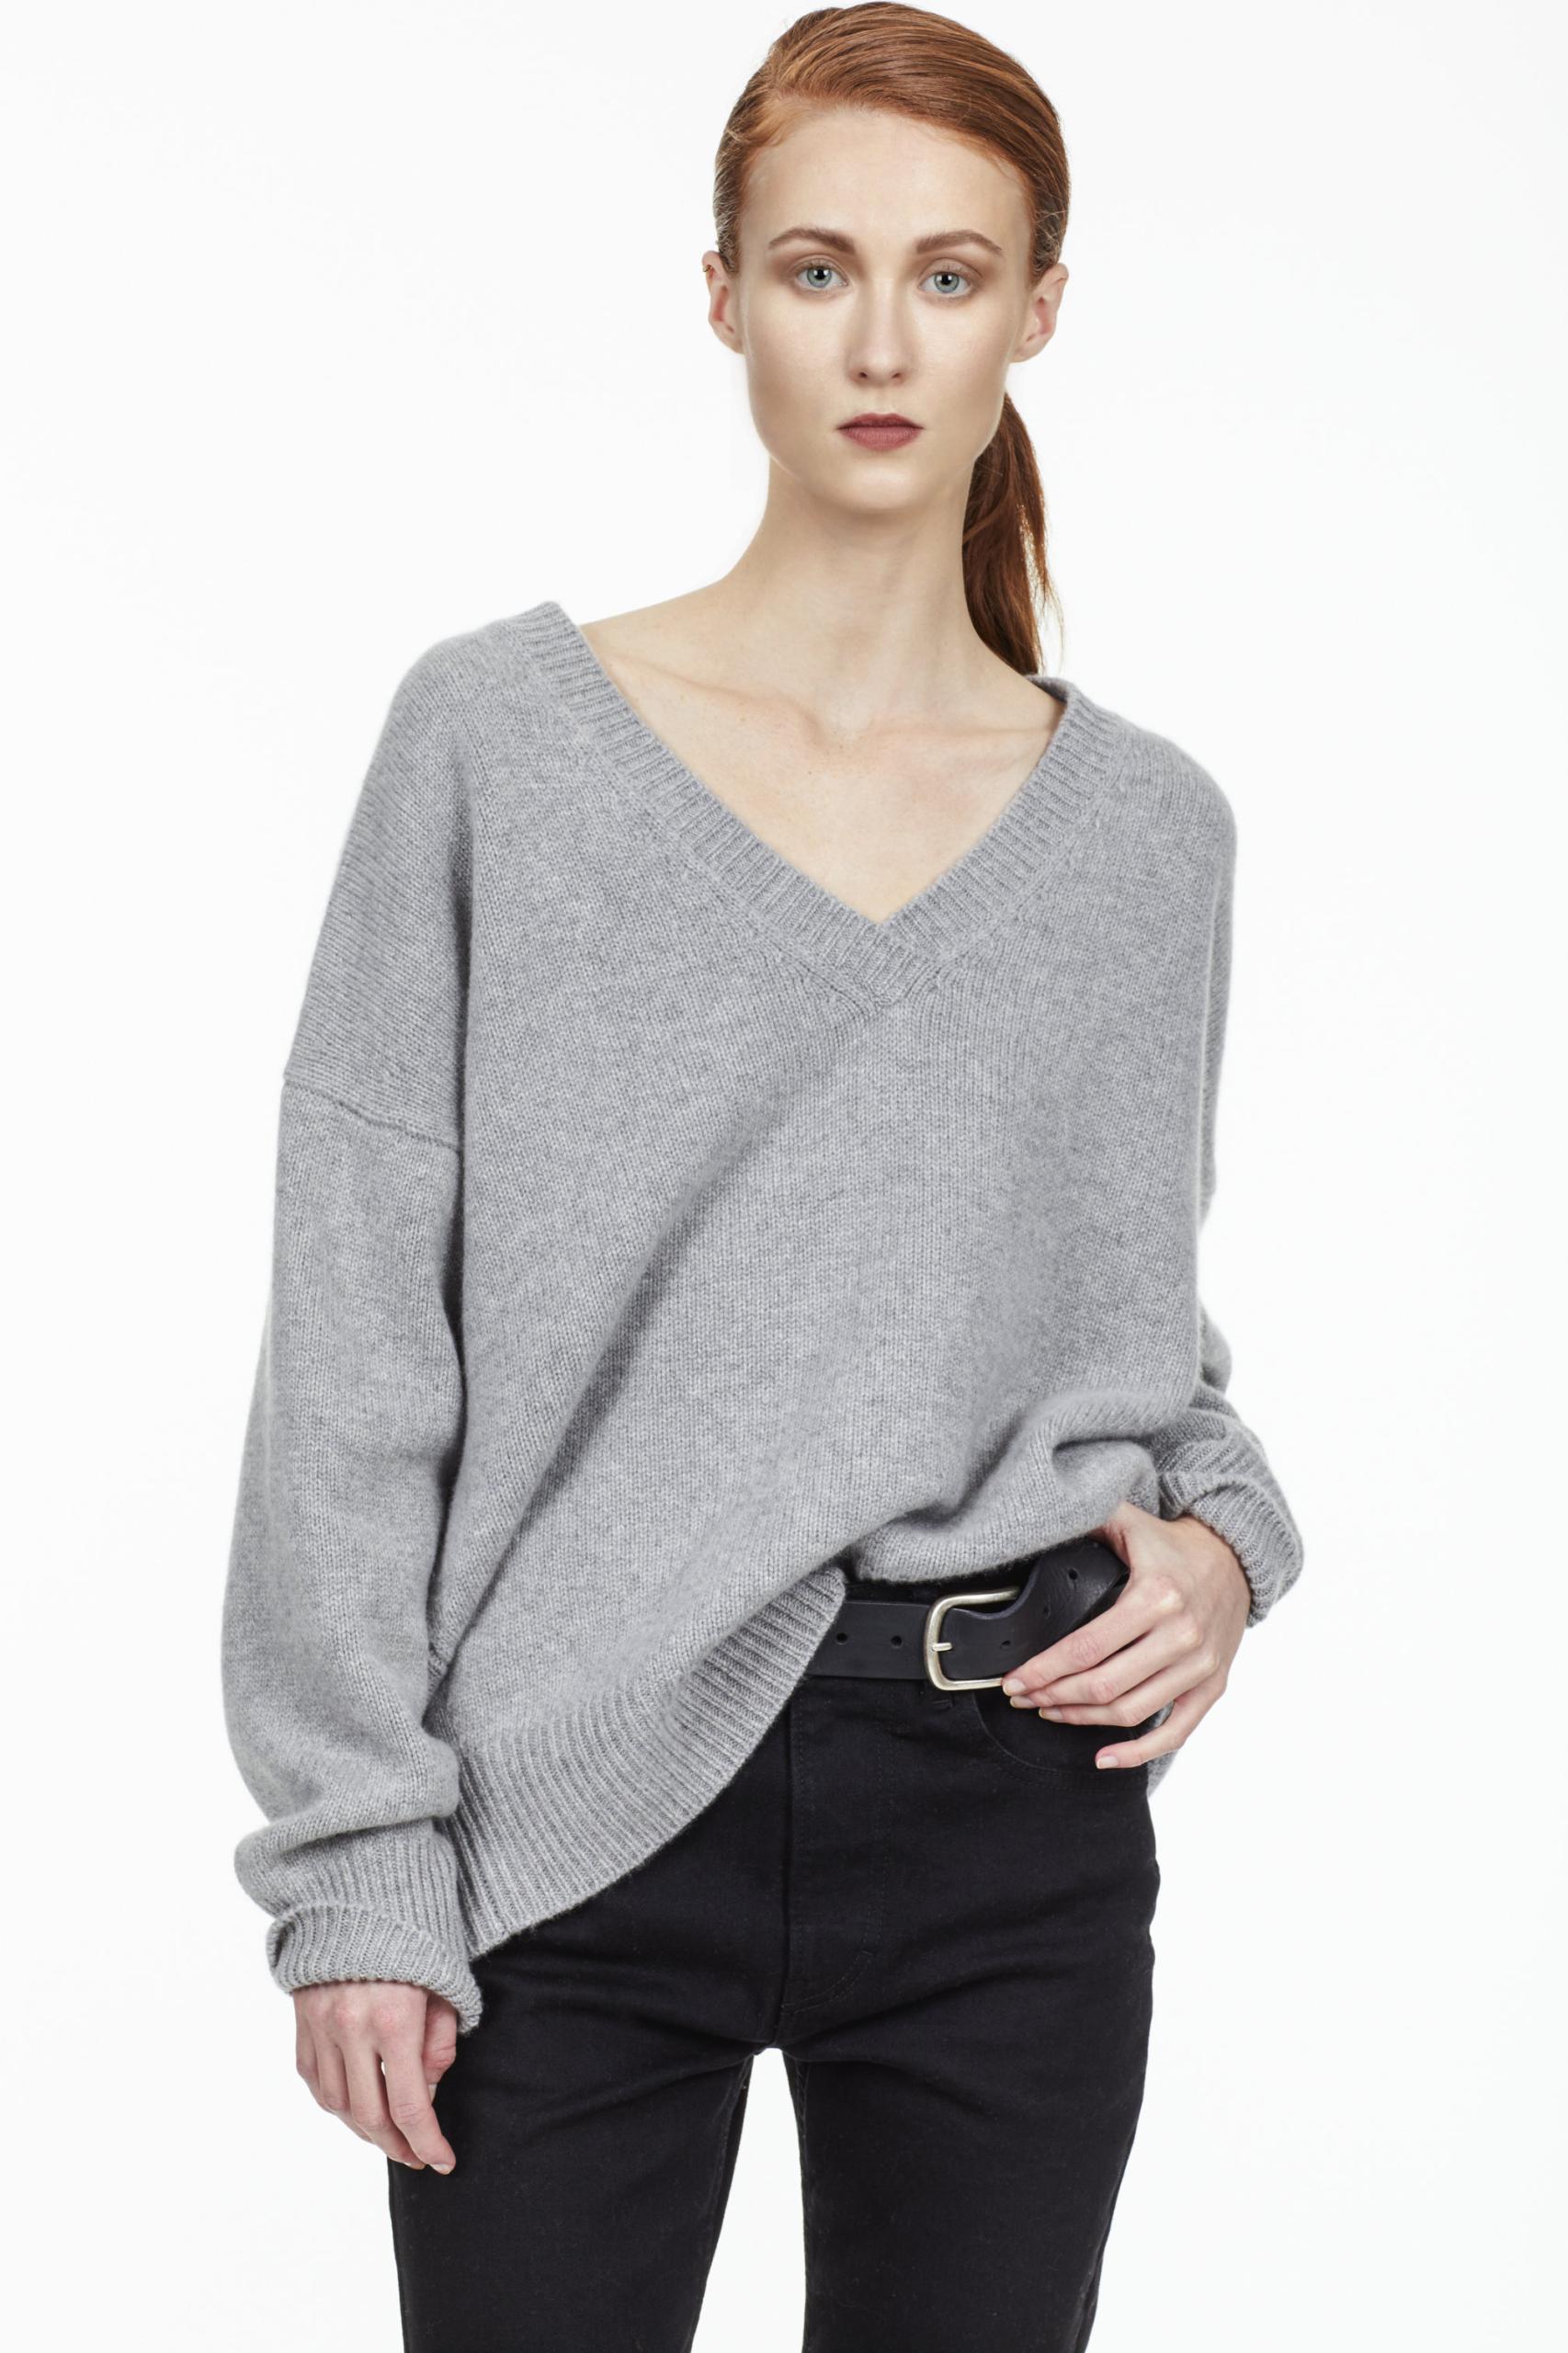 Lis-Lareida_cashmere_knitwear